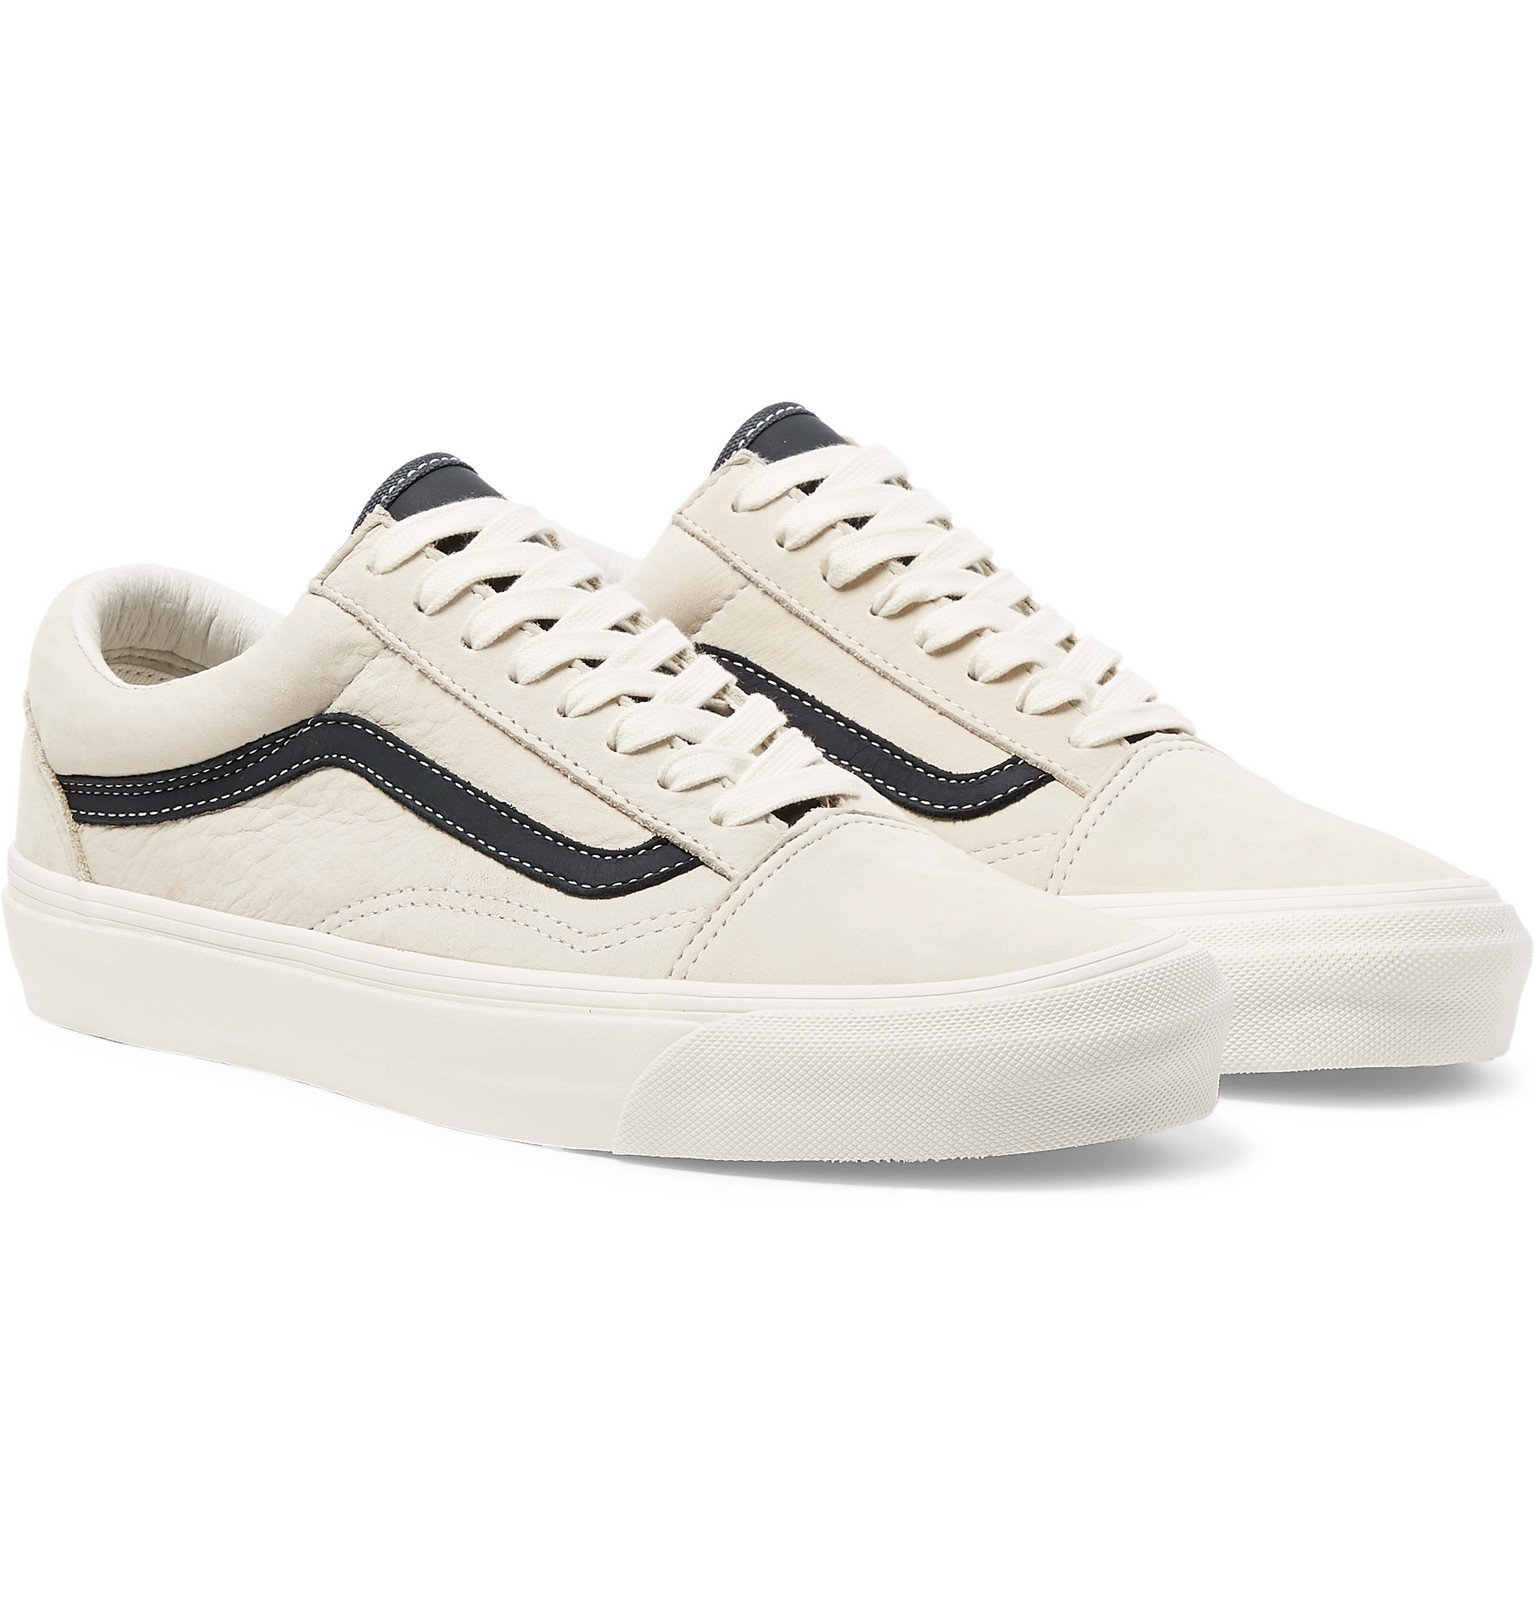 Photo: Vans - OG Old Skool LX Leather-Trimmed Nubuck Sneakers - Neutrals